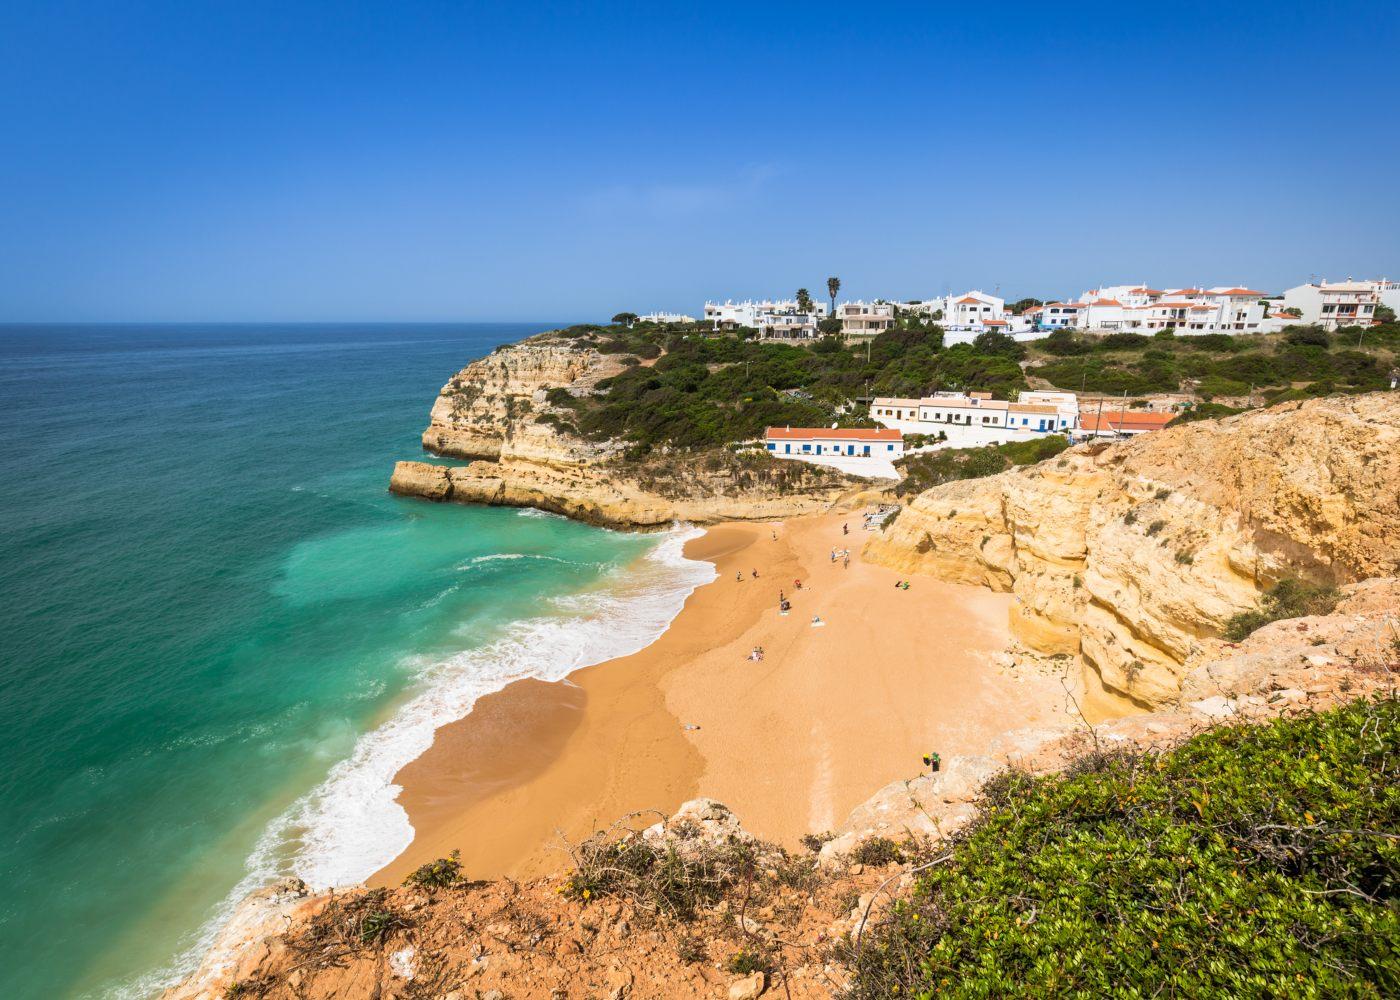 Praias do Algarve em Benagil